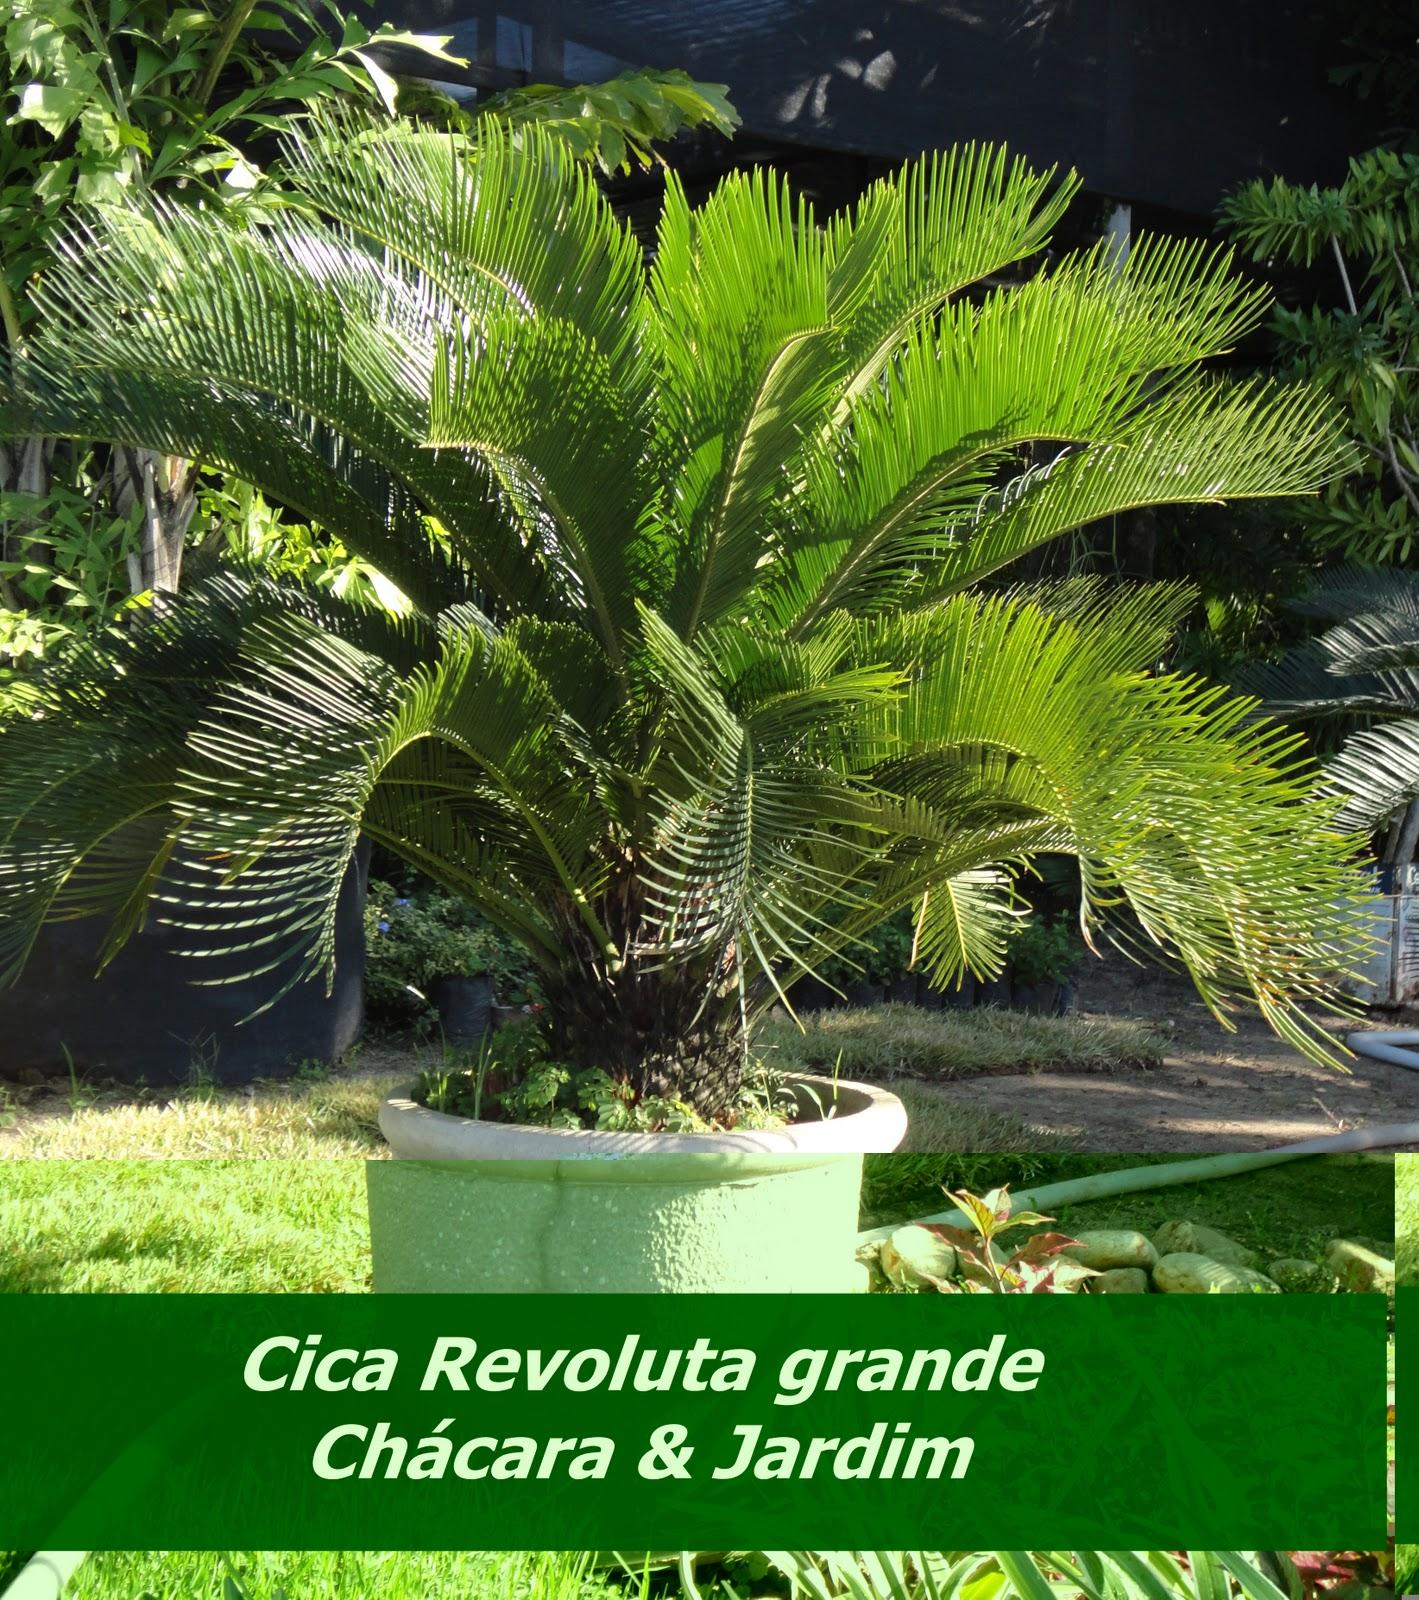 fotos jardim paisagismo:Chácara & Jardim Paisagismo